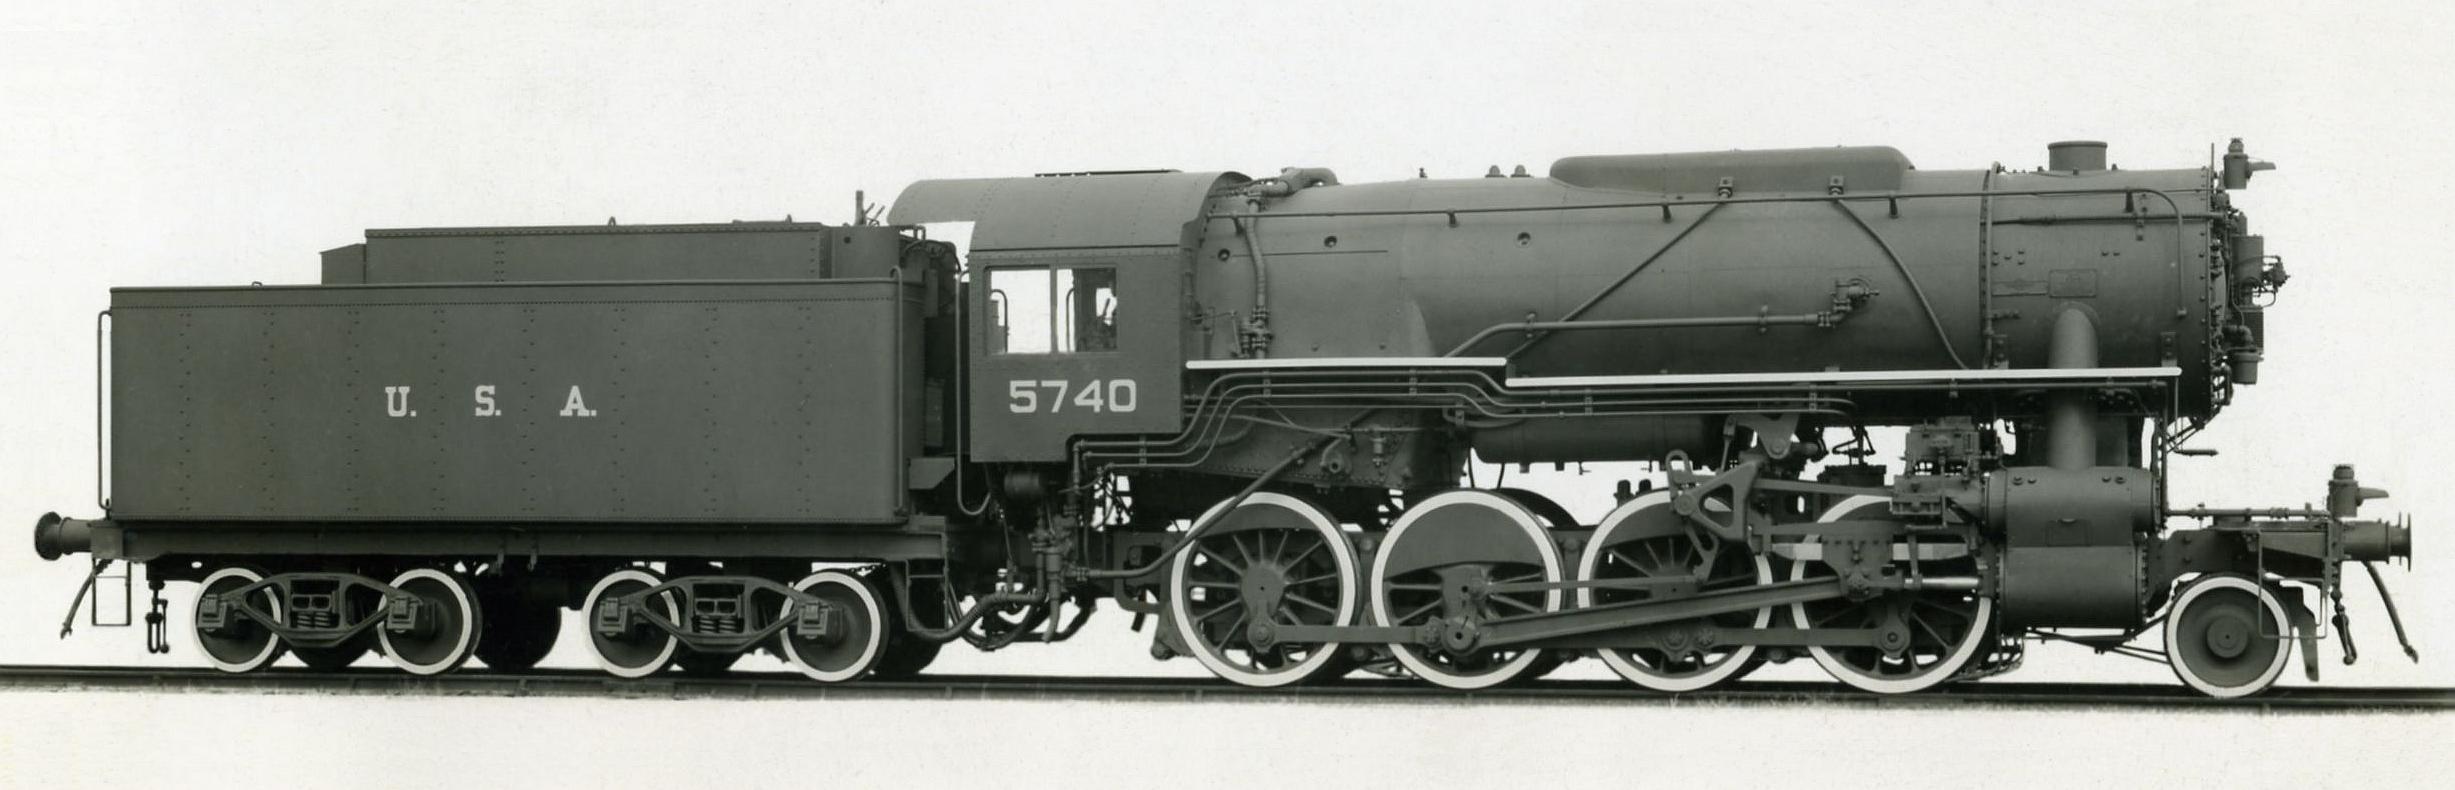 USATC-5740_locomotive.jpg